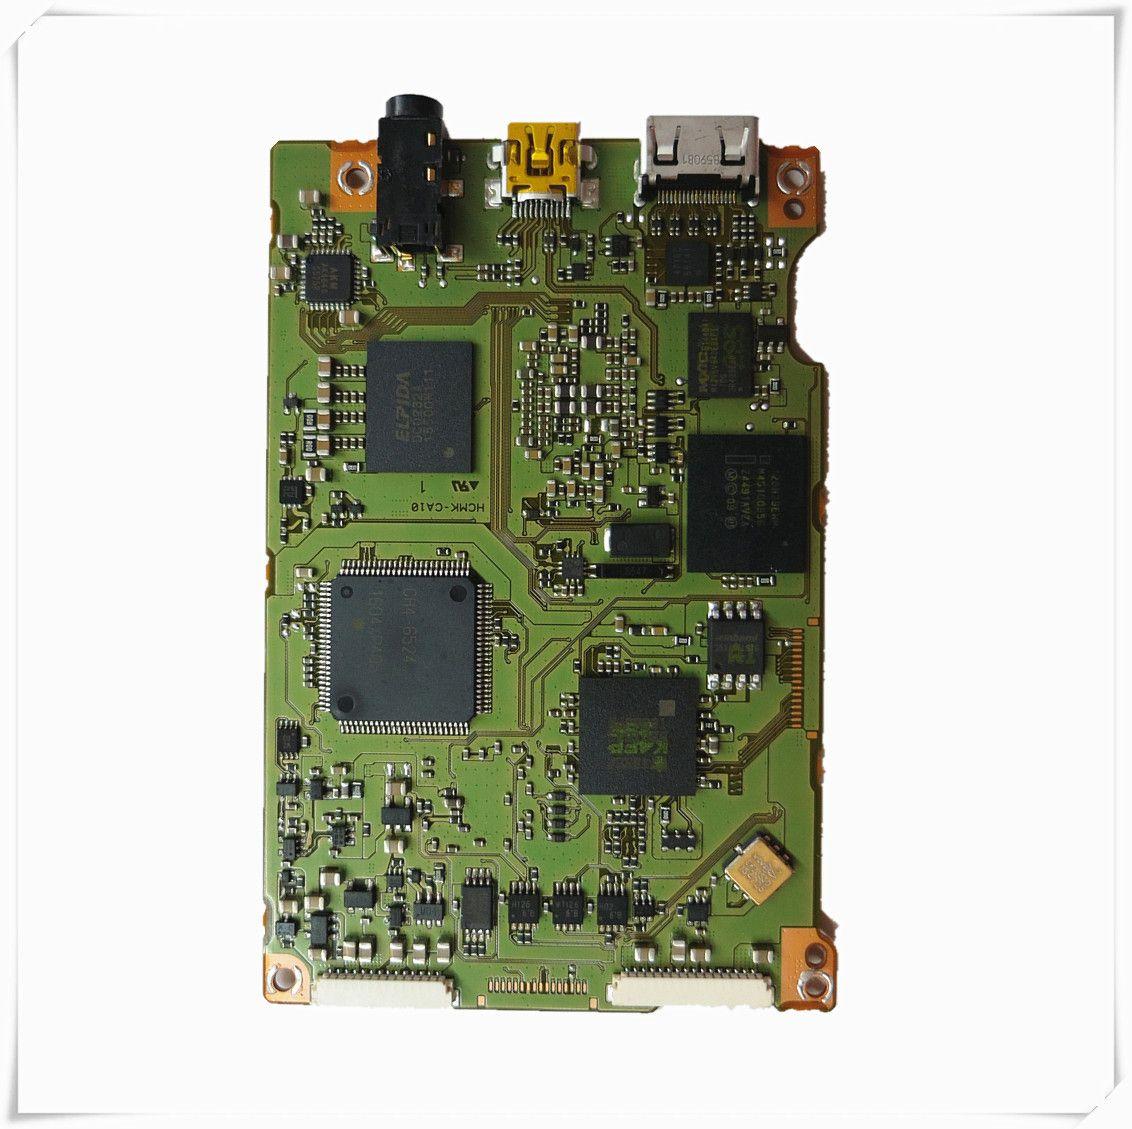 100% Original 5D Mark III 5D MARKIII 5DIII 5D3 MAIN BOARD Mother board For Canon